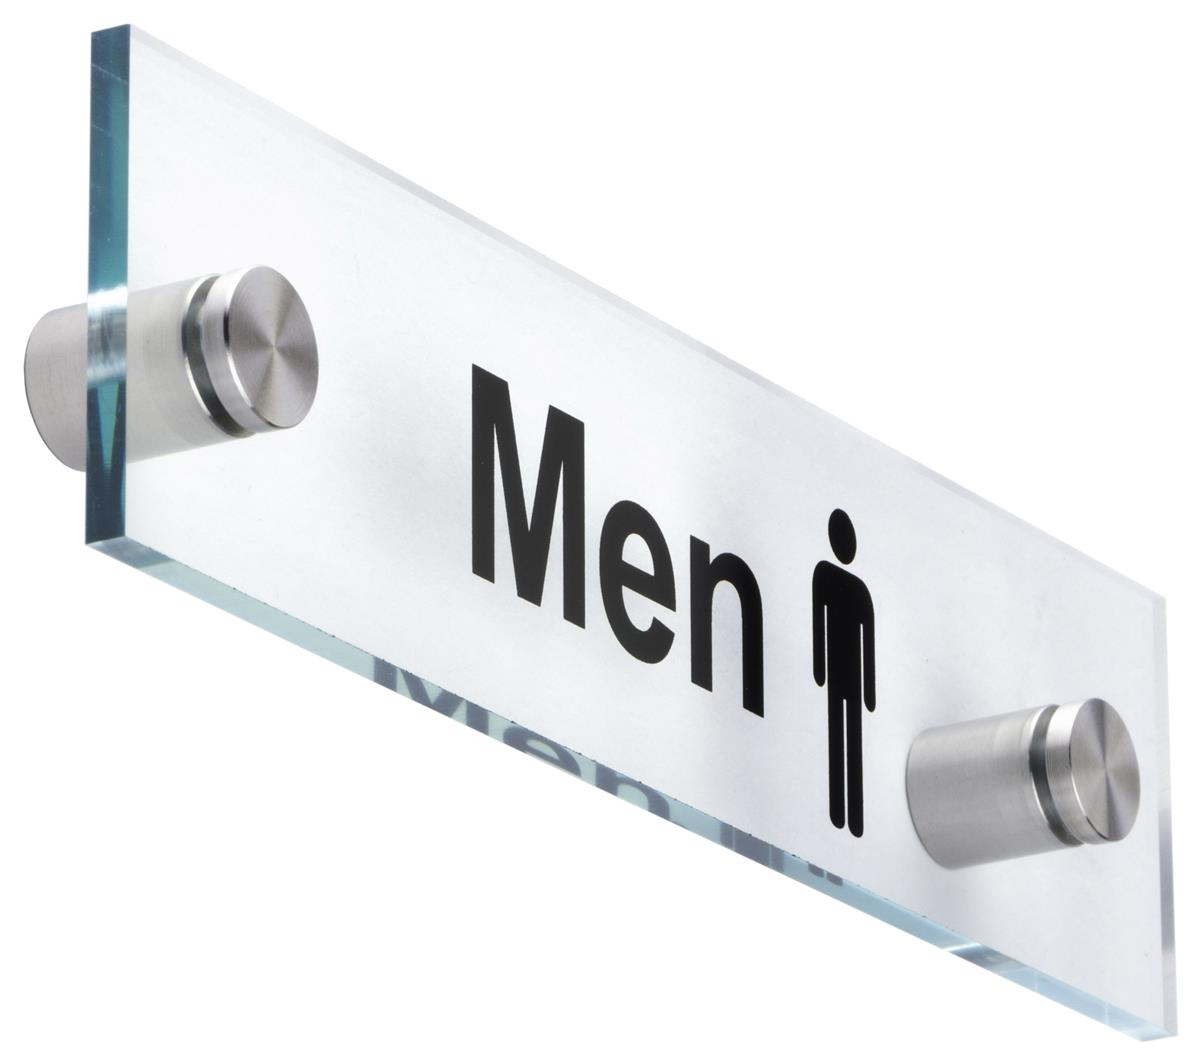 mens bathroom sign. u201cmenu201d bathroom sign clear with standoffs mens r